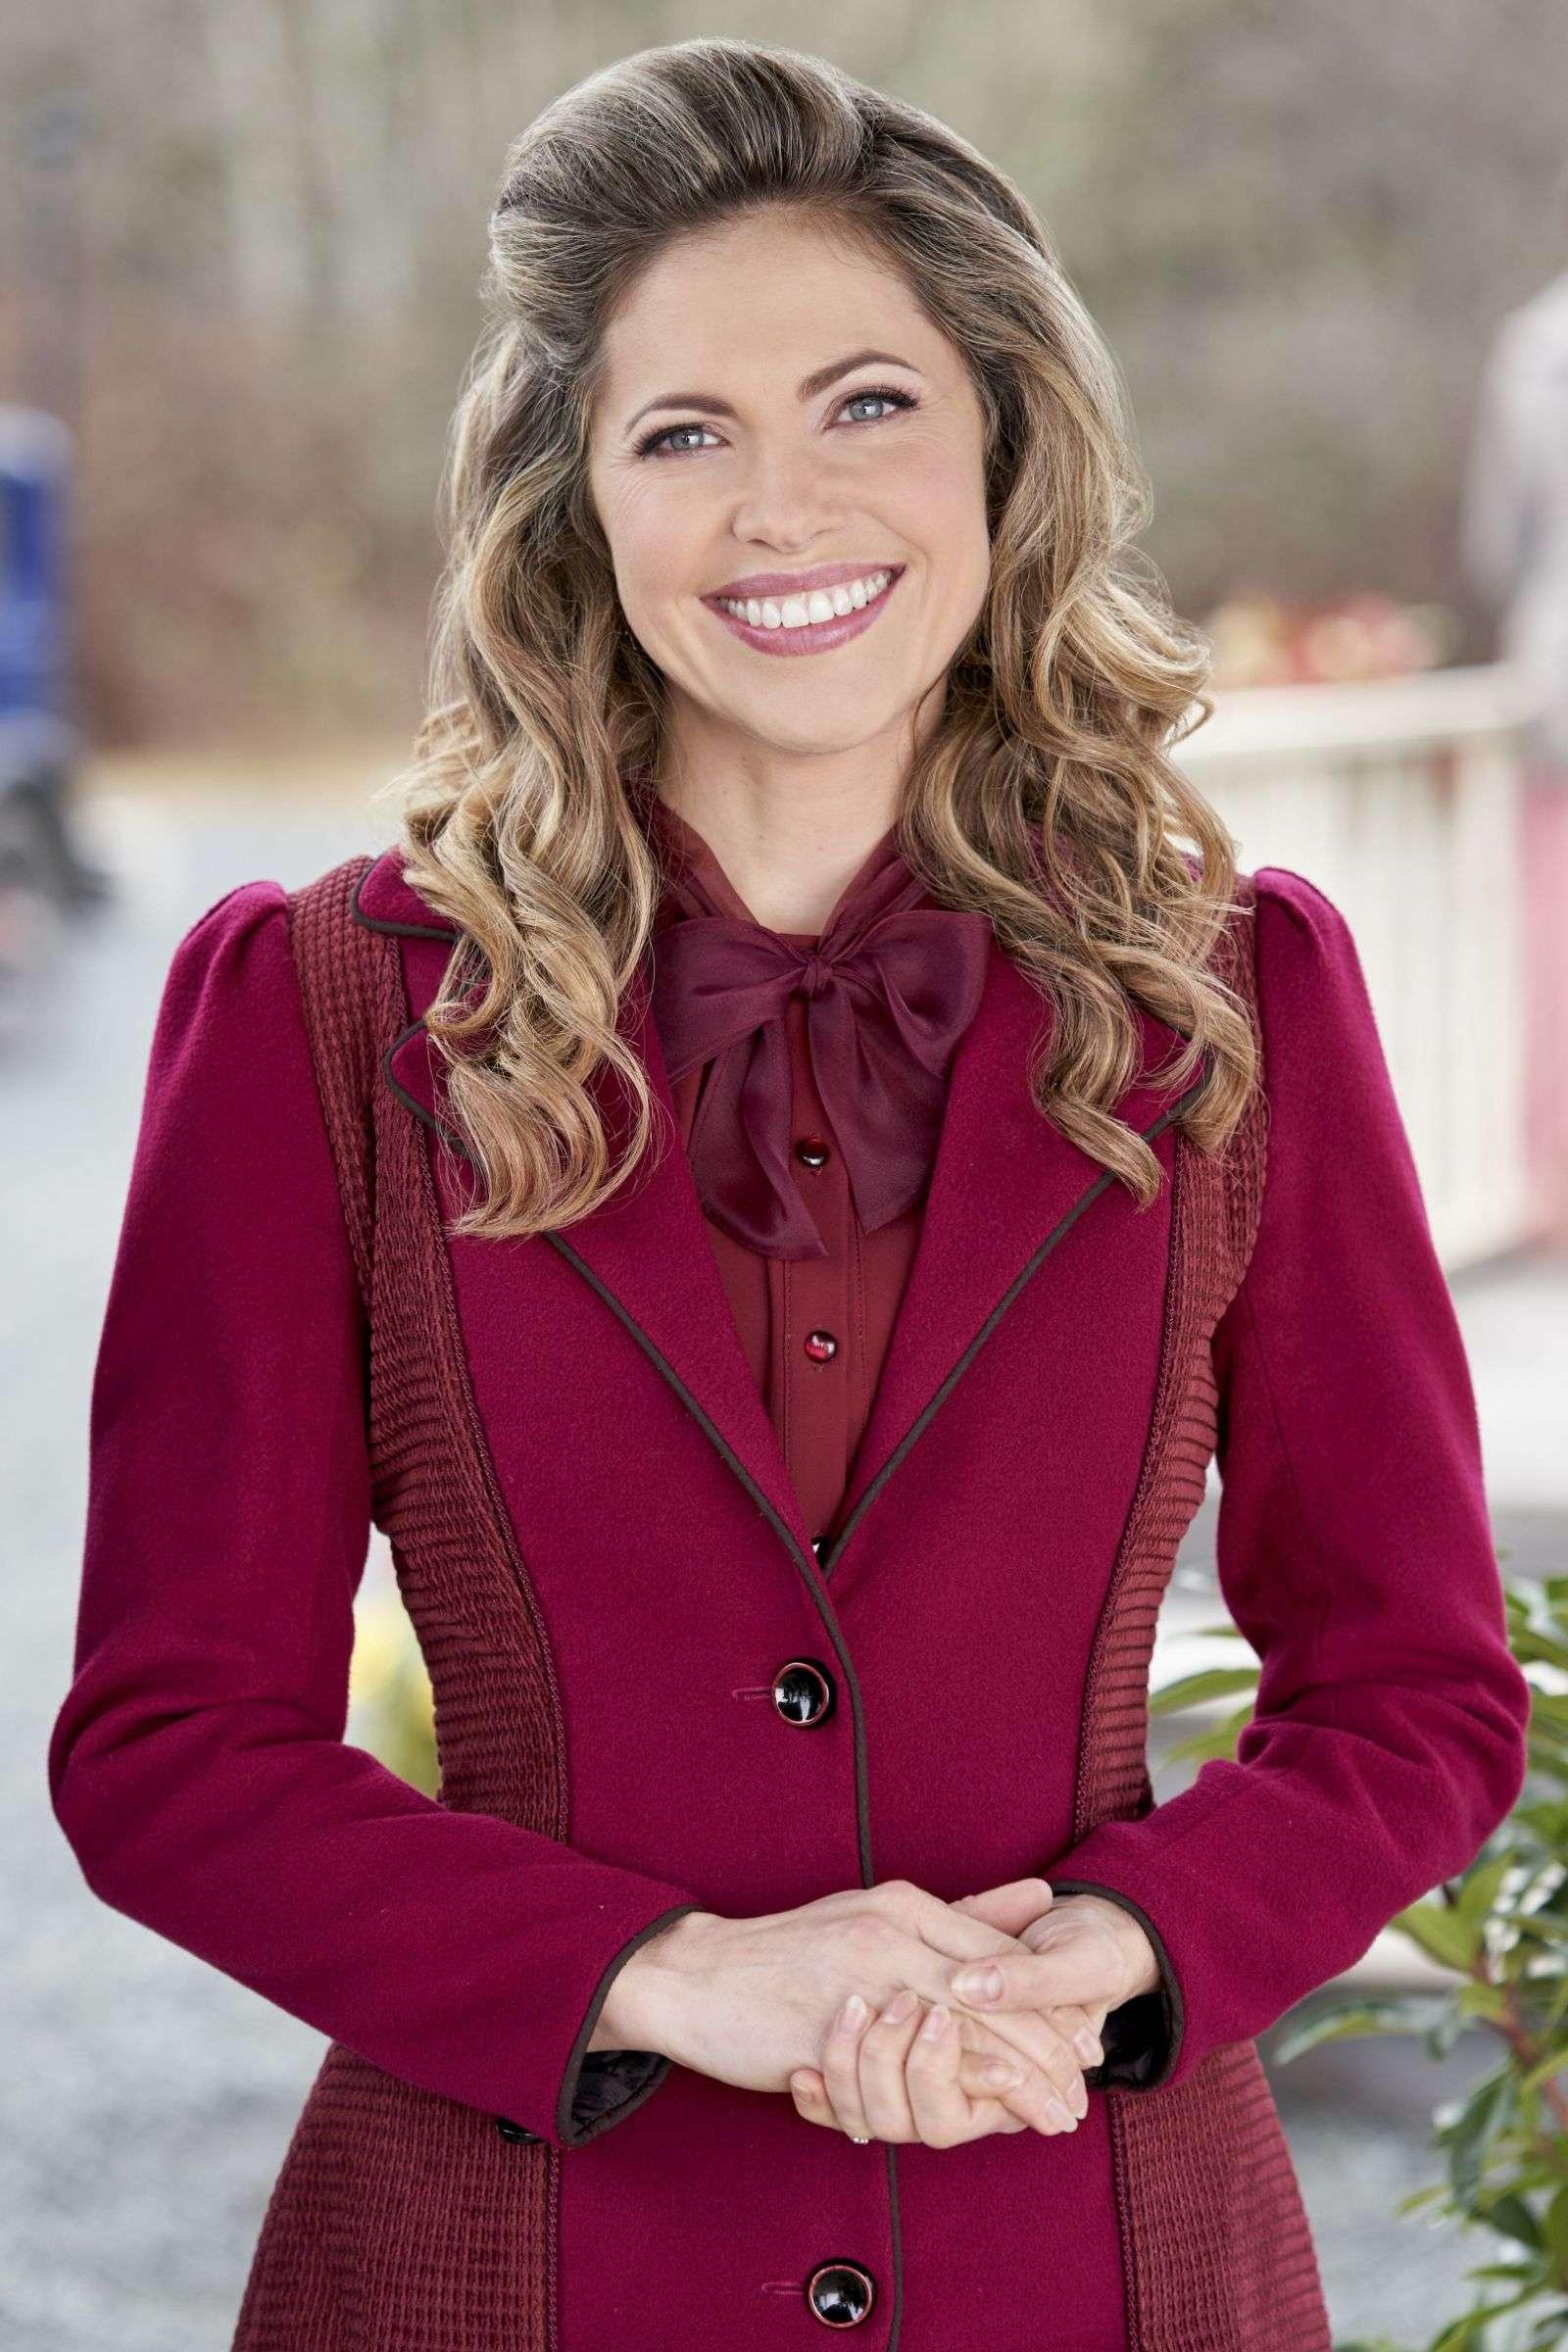 Pascale Hutton PhotoShoot Stills For the Heart Season 7 (2020) HD